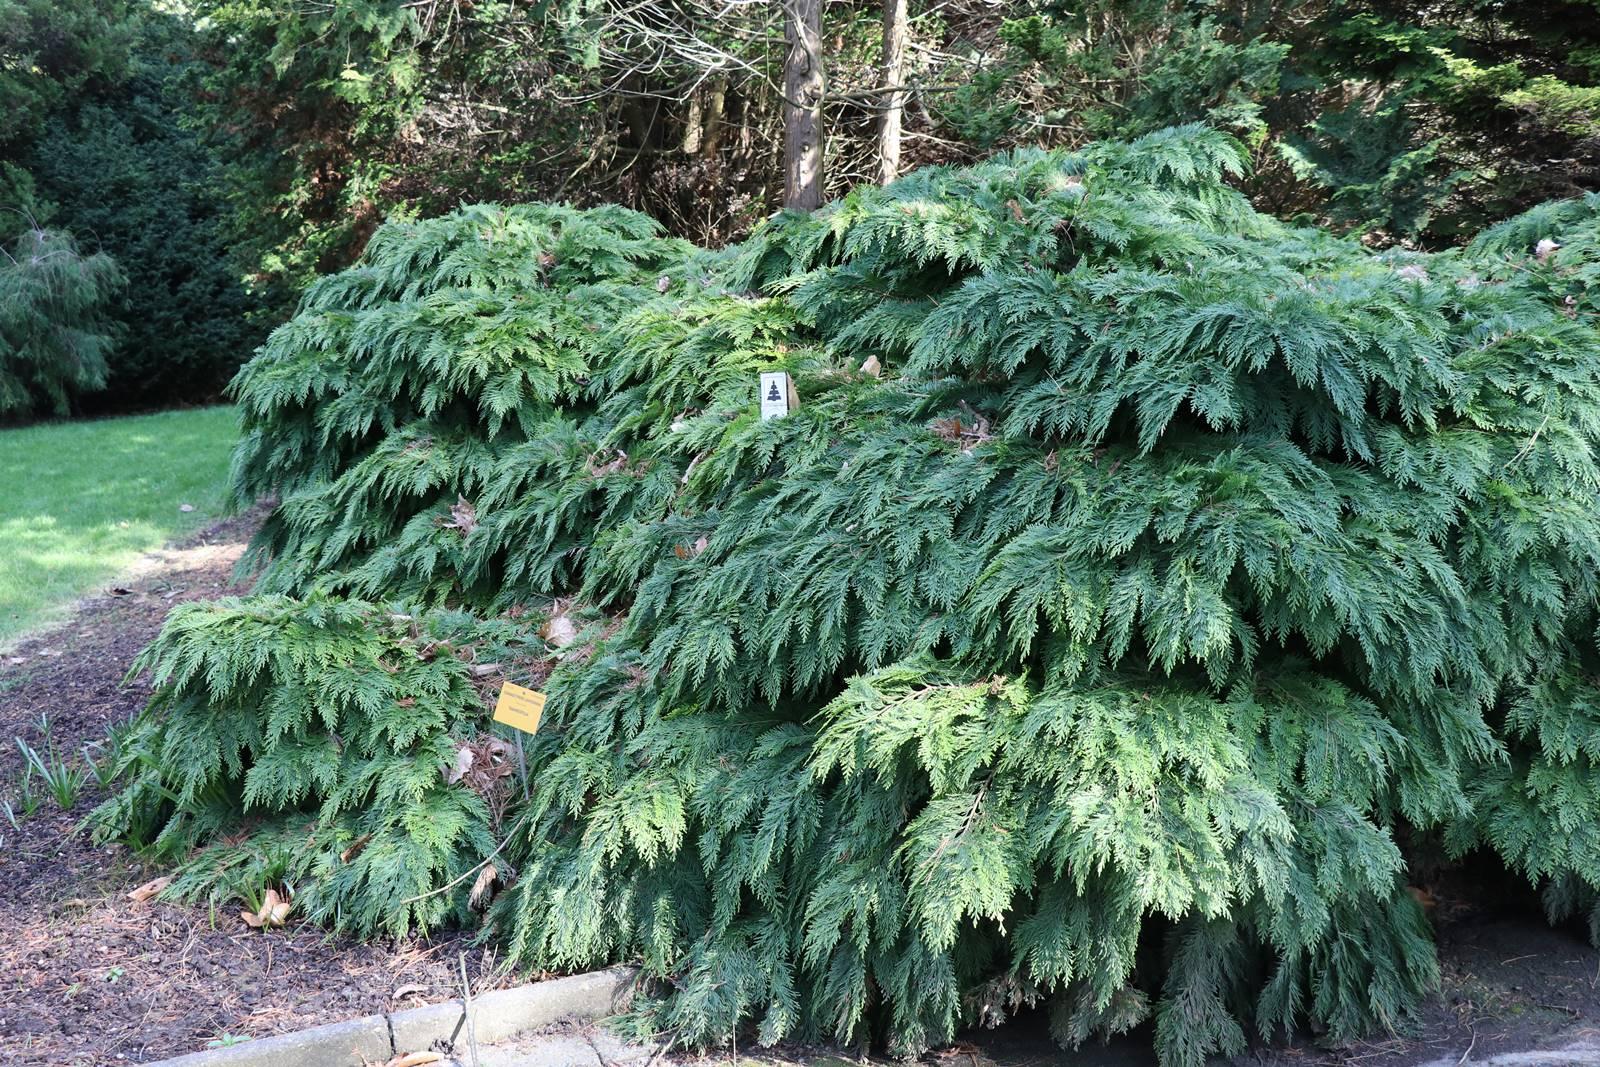 Chamaecyparis lawsoniana Tamariscifolia